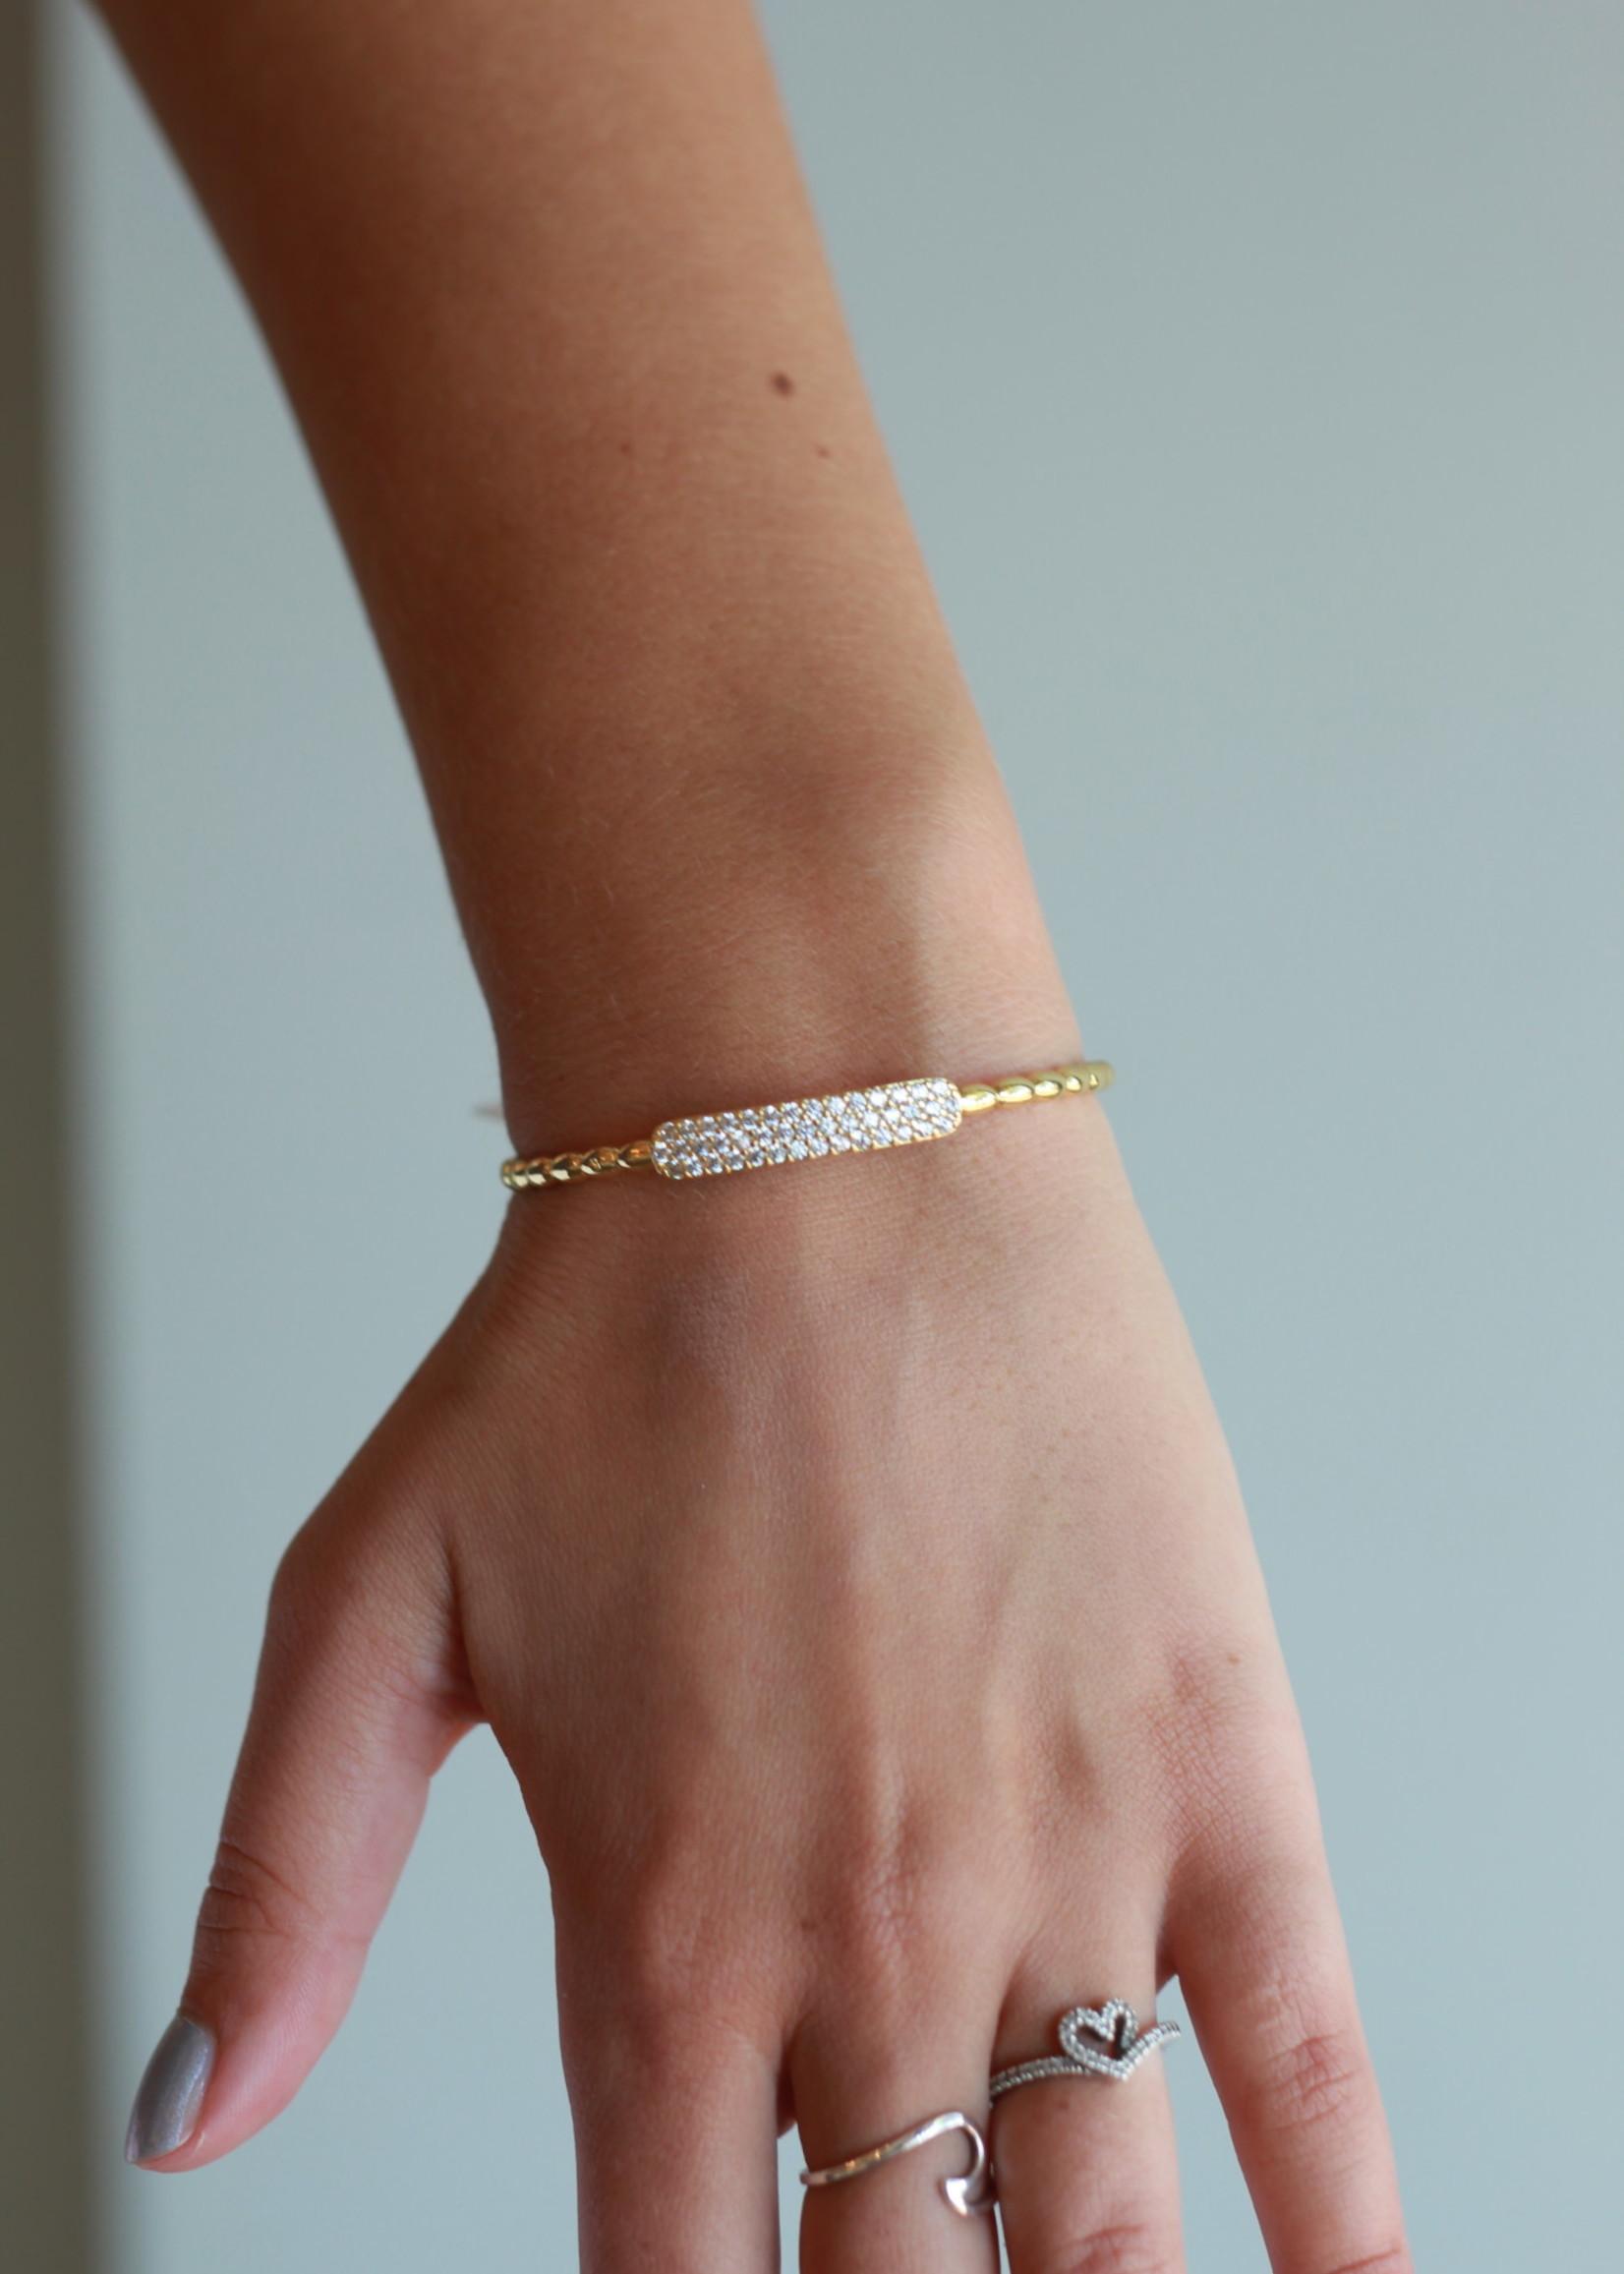 Allison Conway AC Twinkle Cuff Bracelet